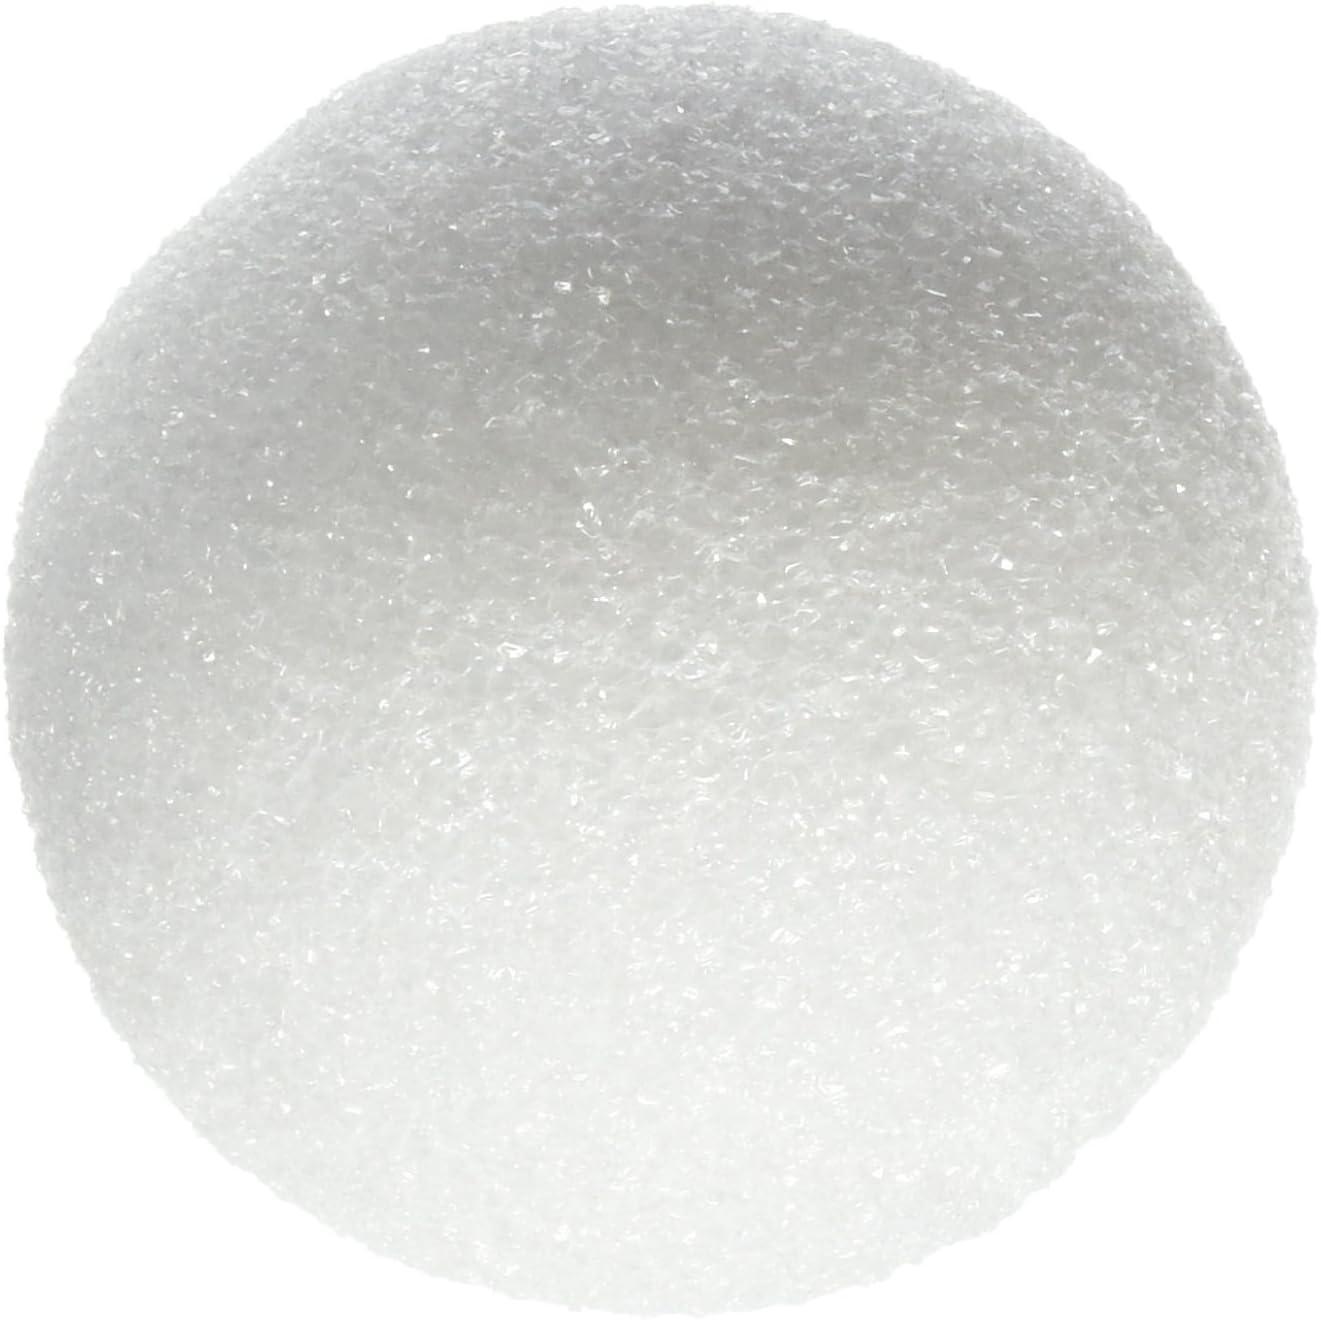 "36pcs White Round Foam Polystyrene Balls Crafts Project Spheres 1.5/"" Flower Ball"